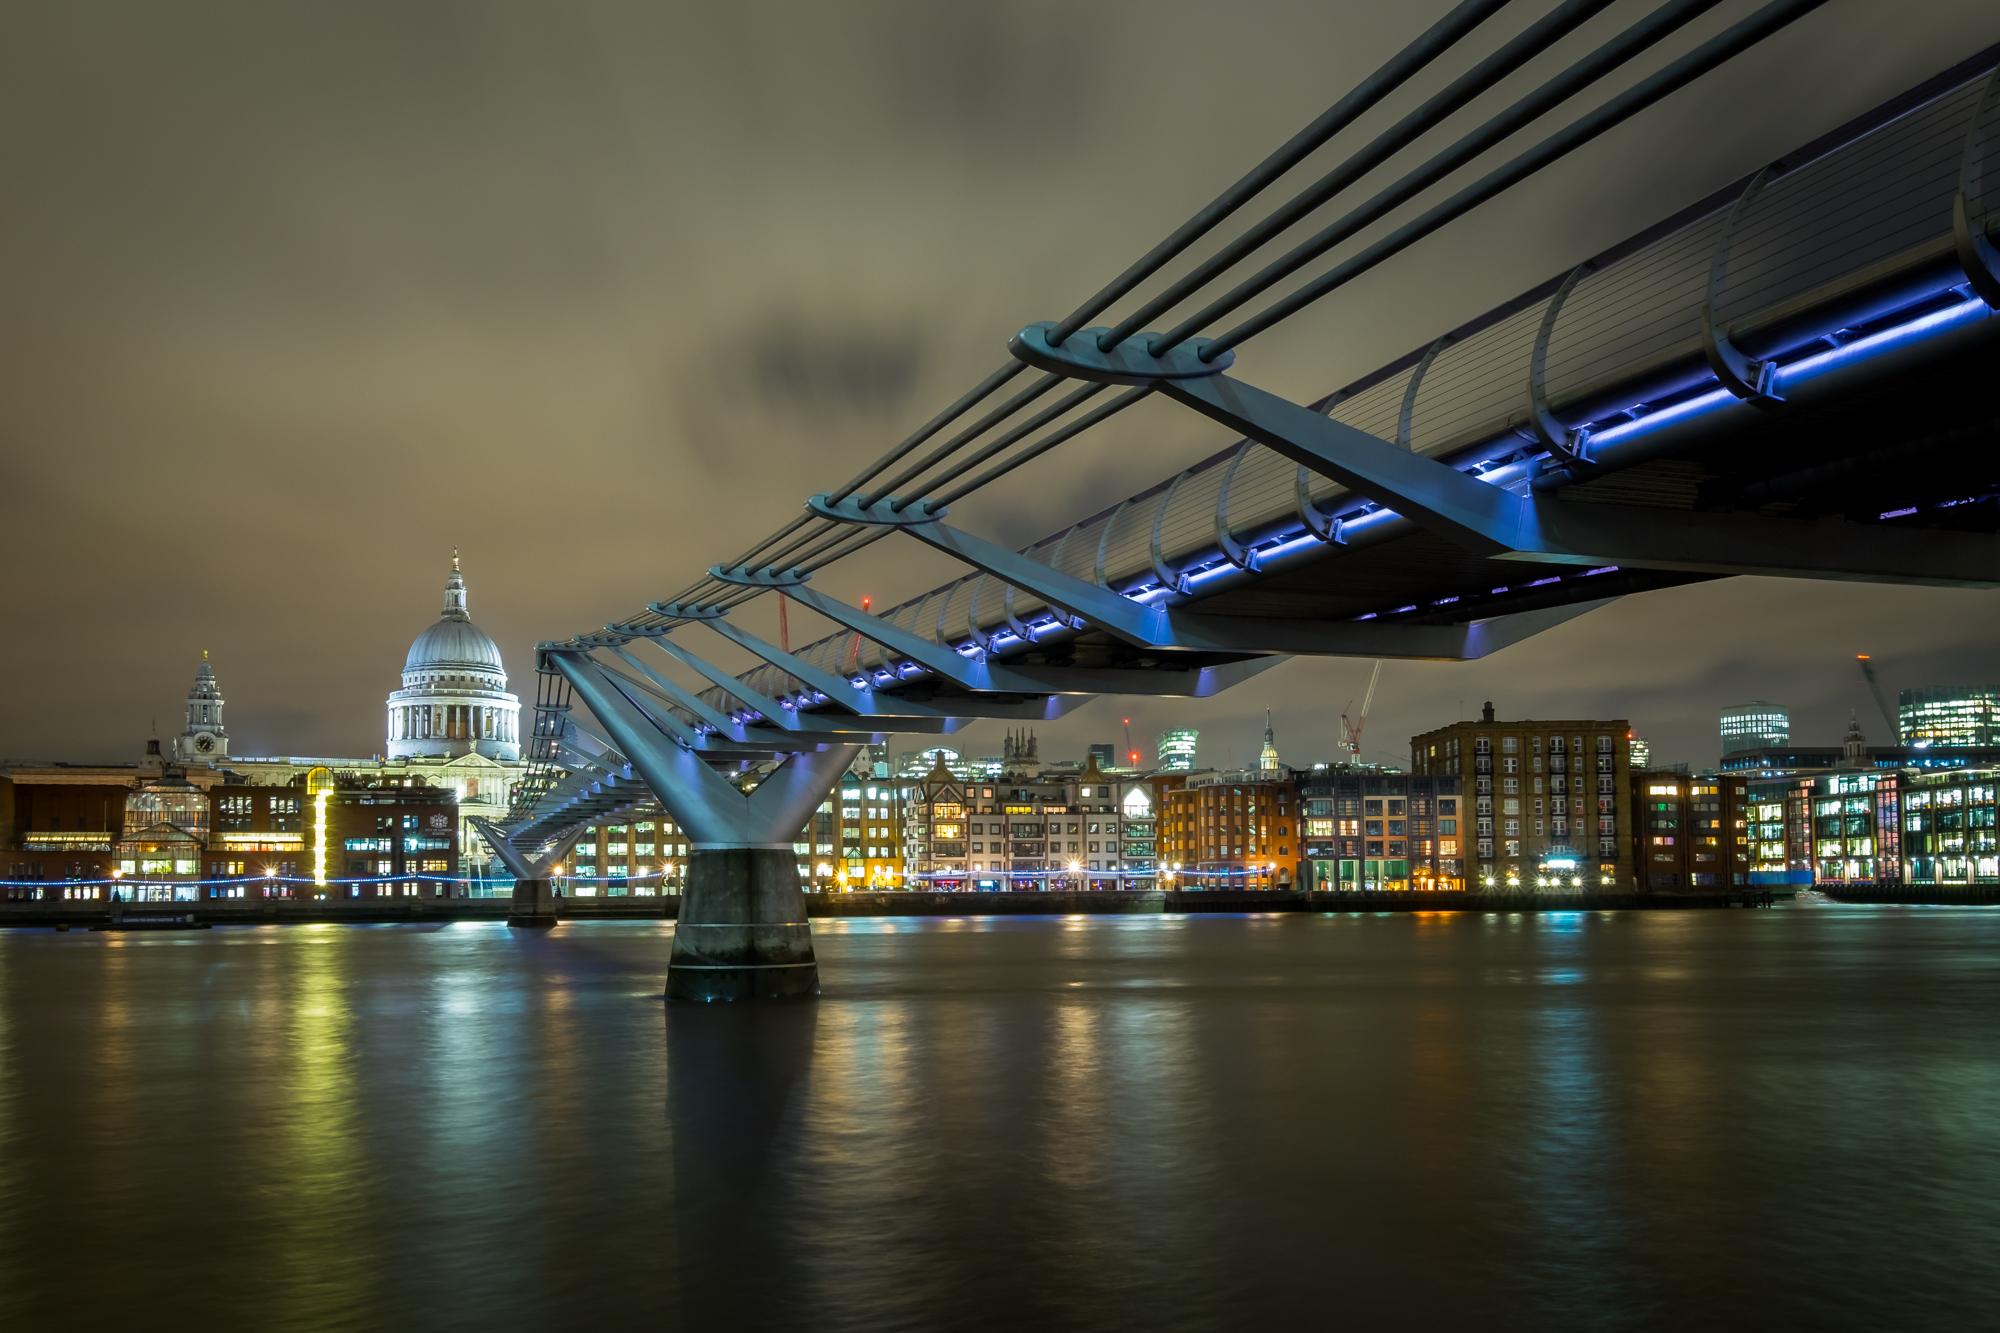 A Photo of the Millennium Bridge at night taken by Trevor Sherwin